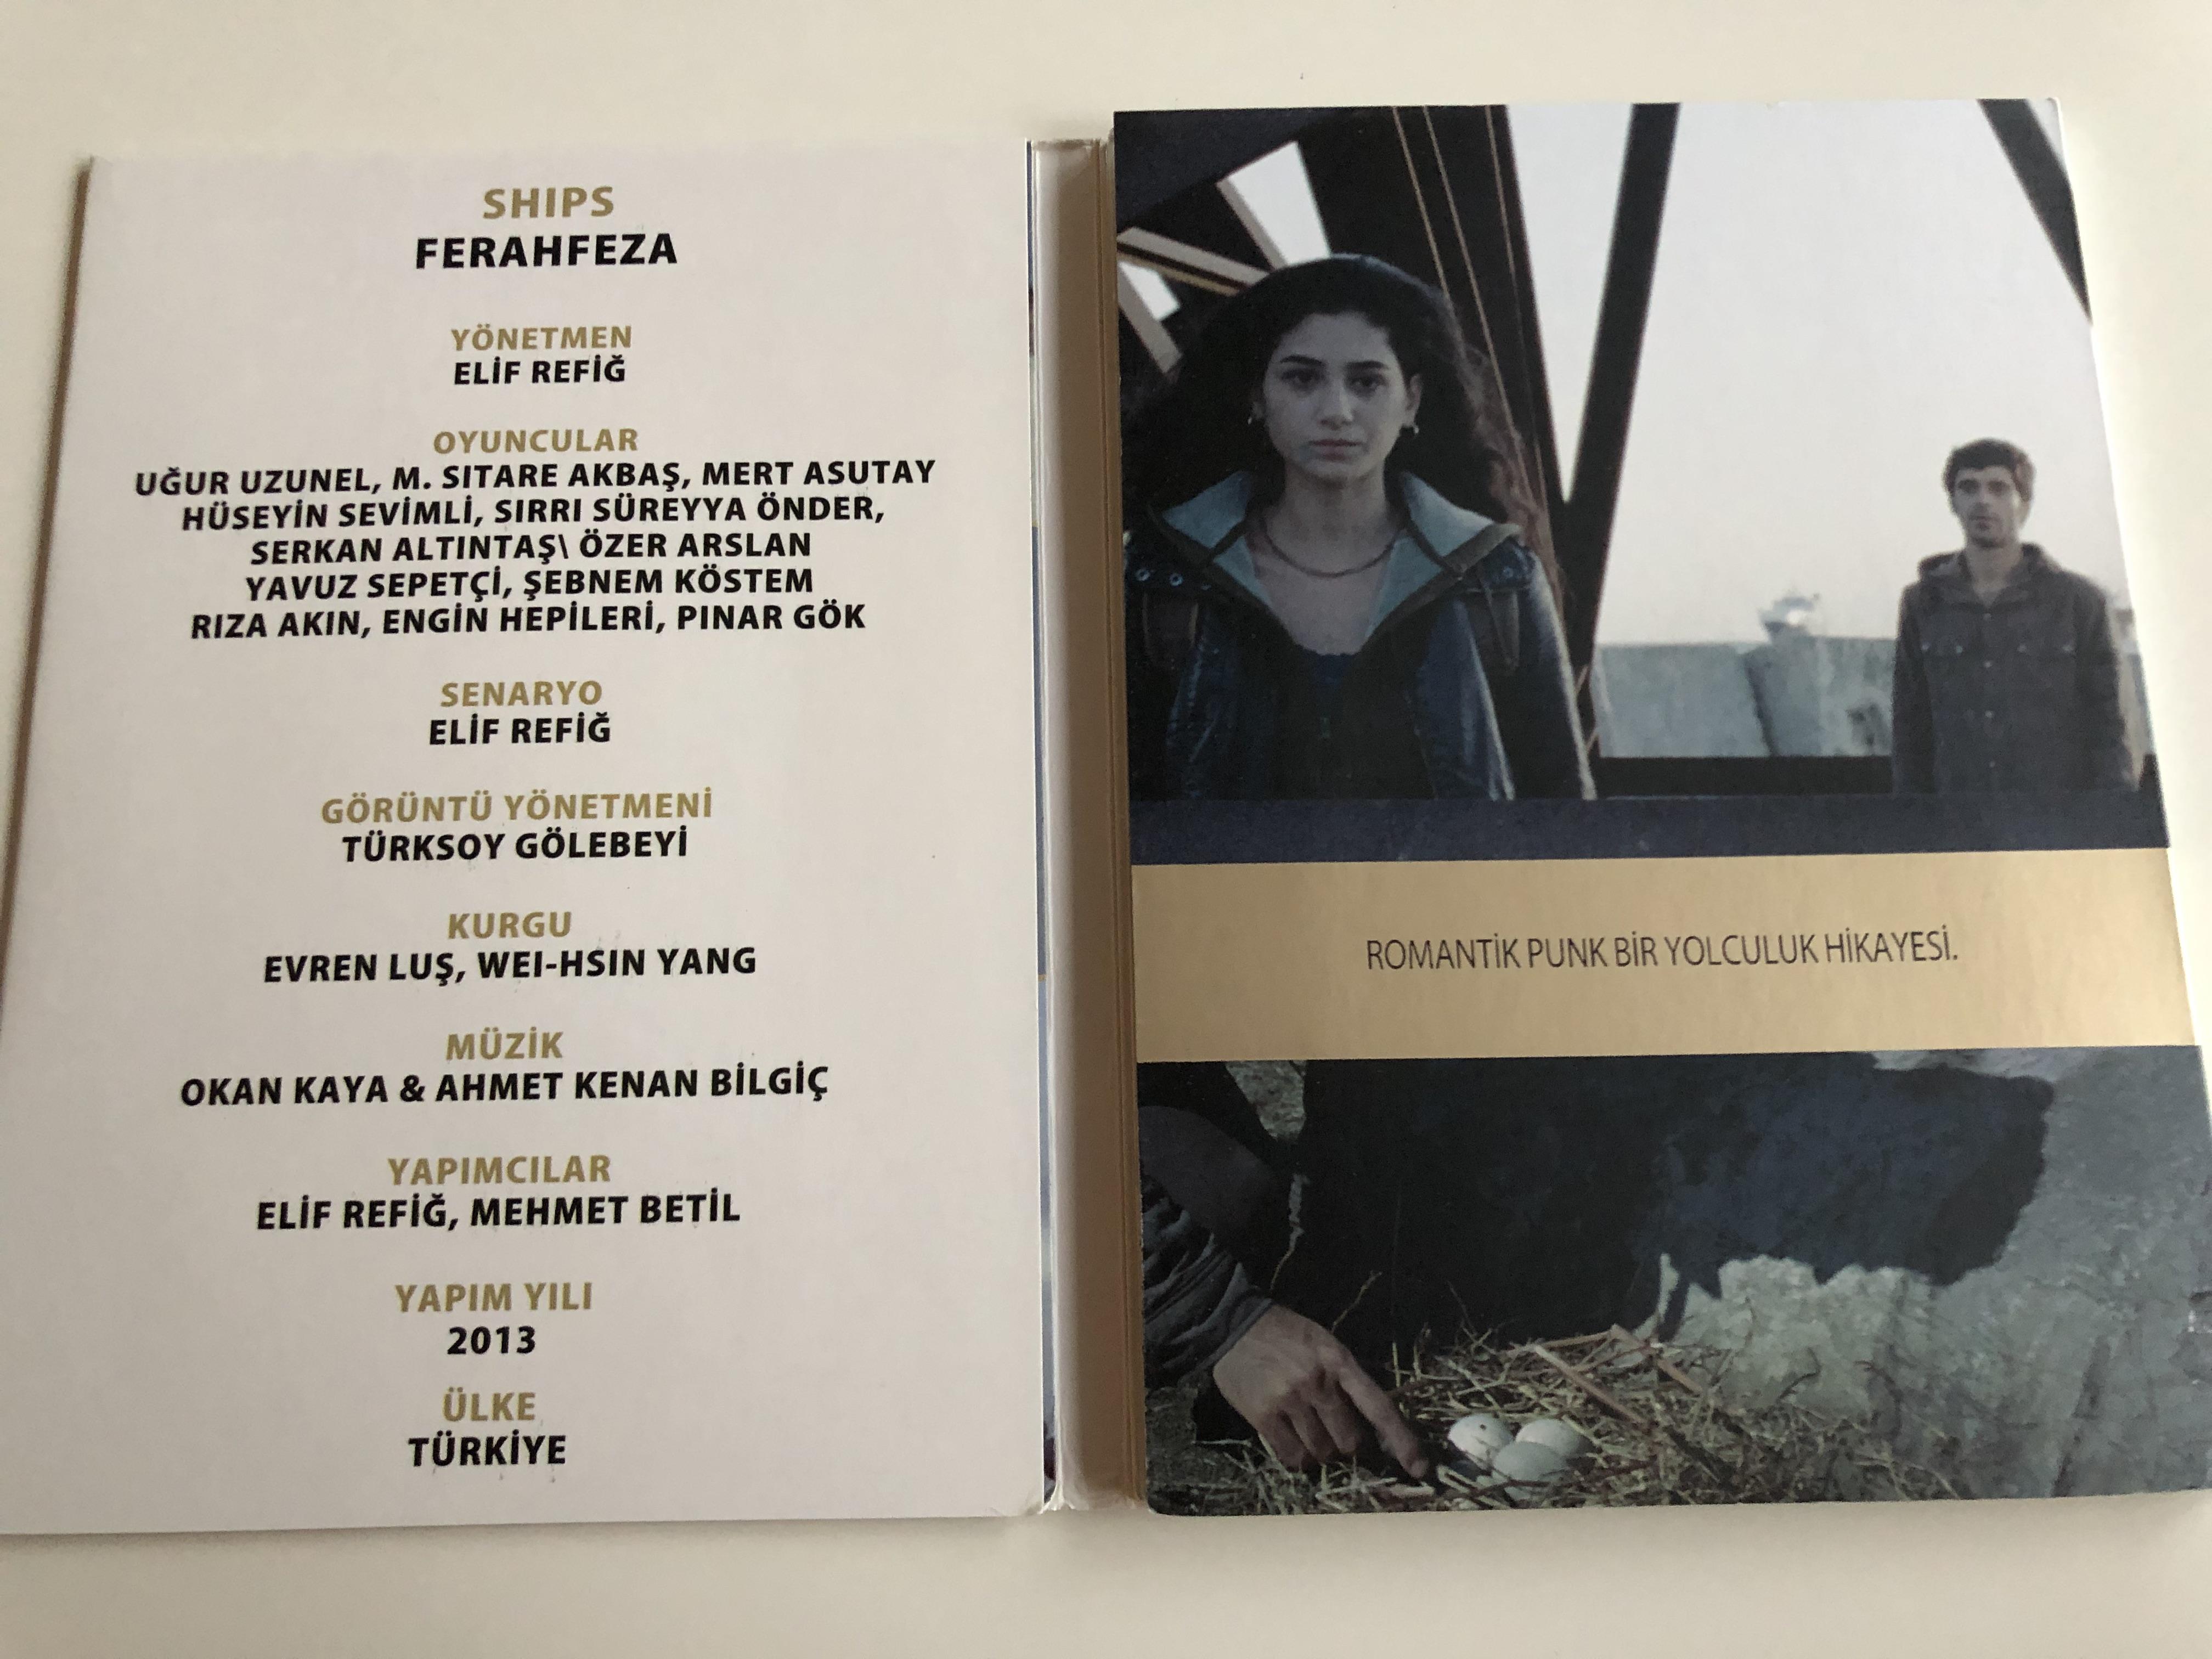 ferahfeza-dvd-2014-ships-directed-by-elif-refi-starring-mert-asutay-u-ur-uzunel-2-.jpg